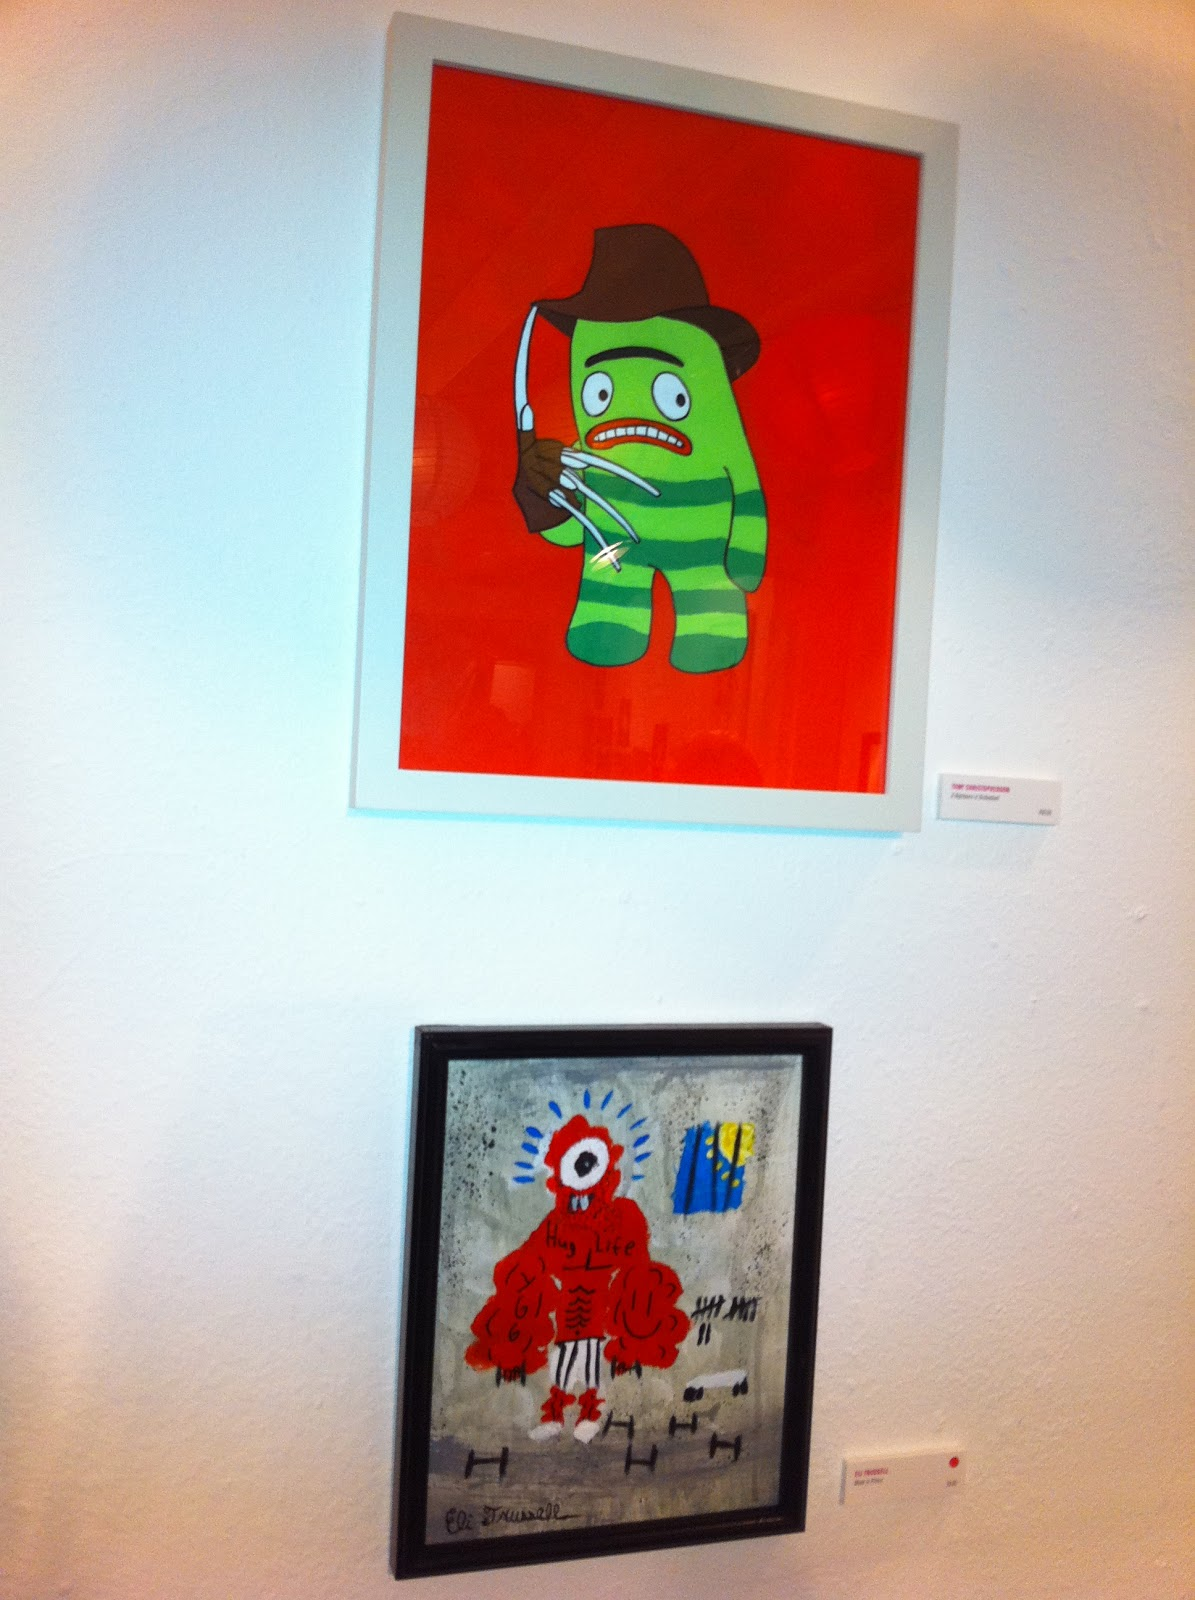 http://3.bp.blogspot.com/-LOWDz1ijTas/TfAWqnjFlbI/AAAAAAAAJmk/YVv89x5hG0g/s1600/Yo+Gabba+Gabba+Art+Show+%252842%2529.JPG